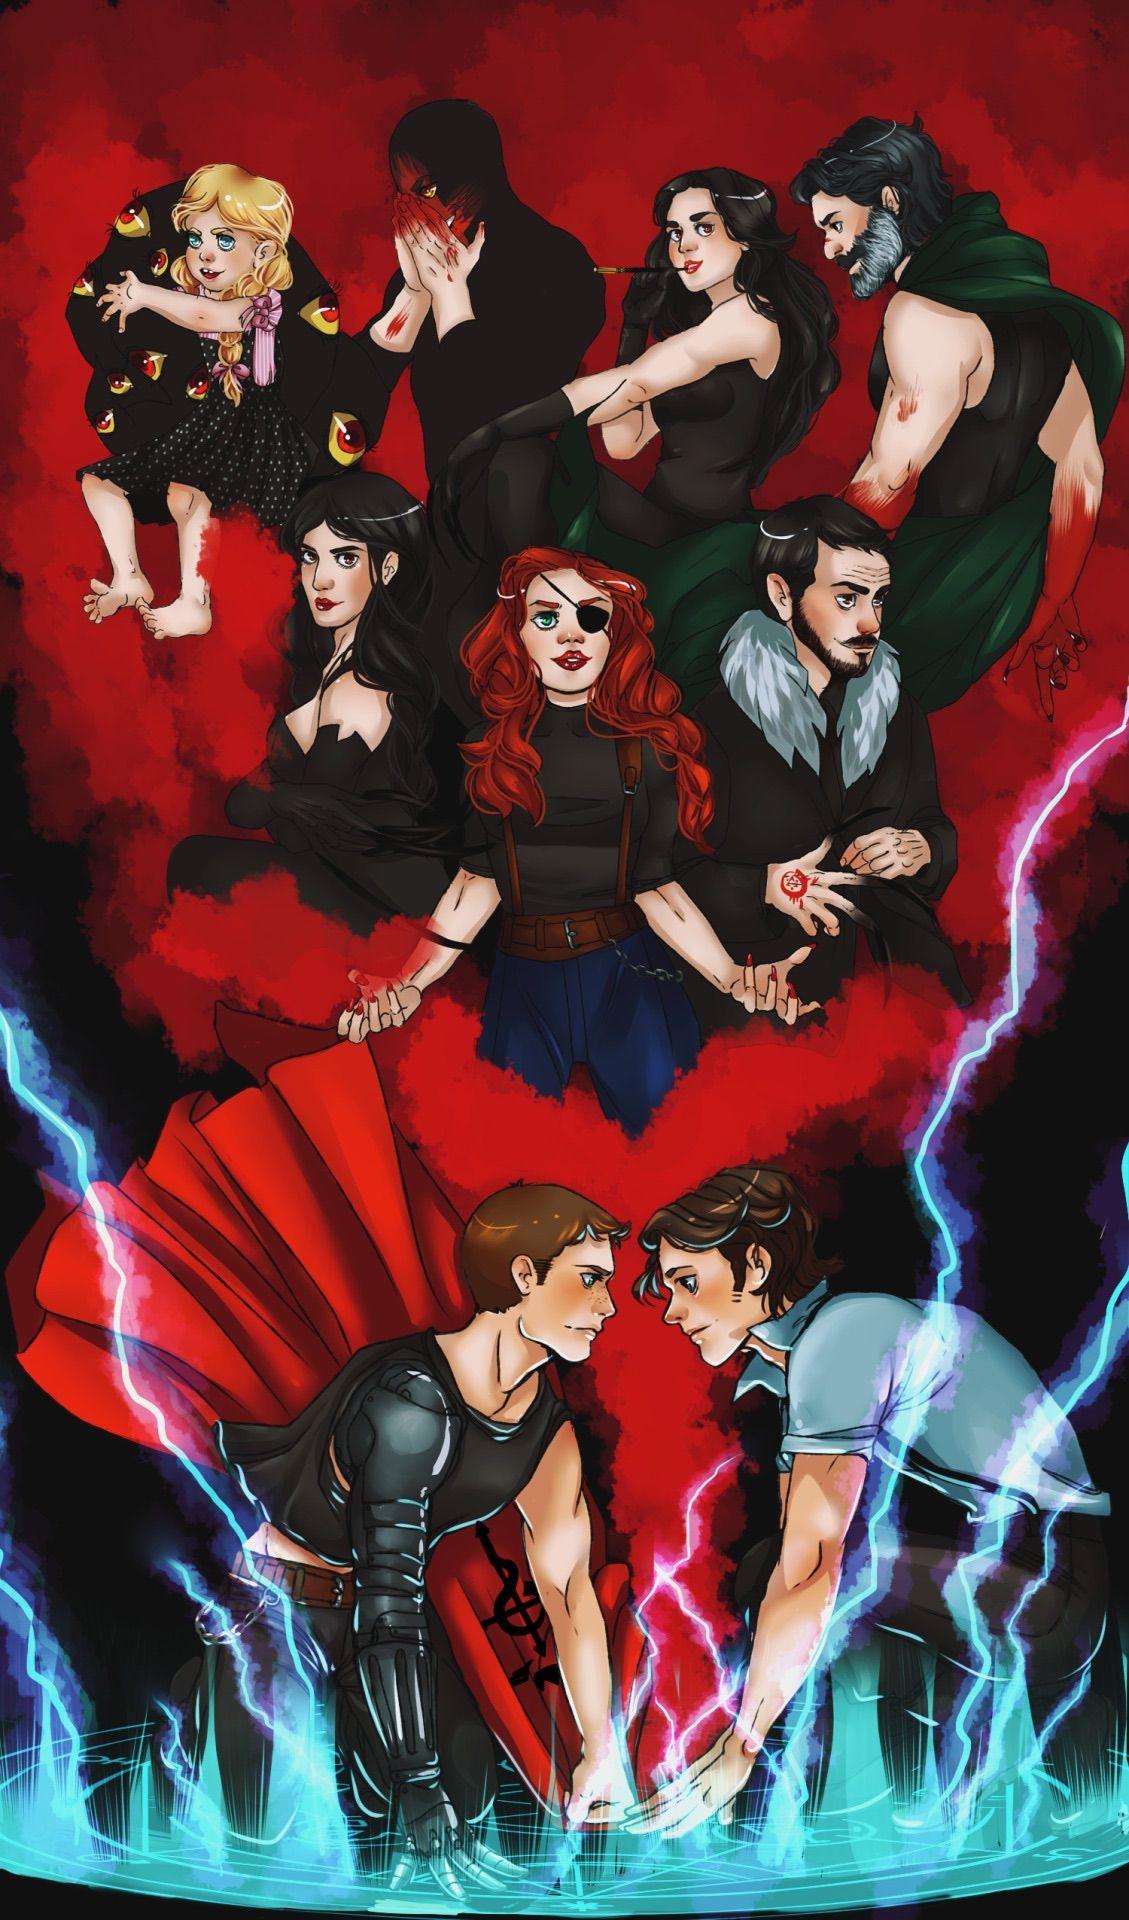 Supernatural x Fullmetal Alchemist...I always thought that